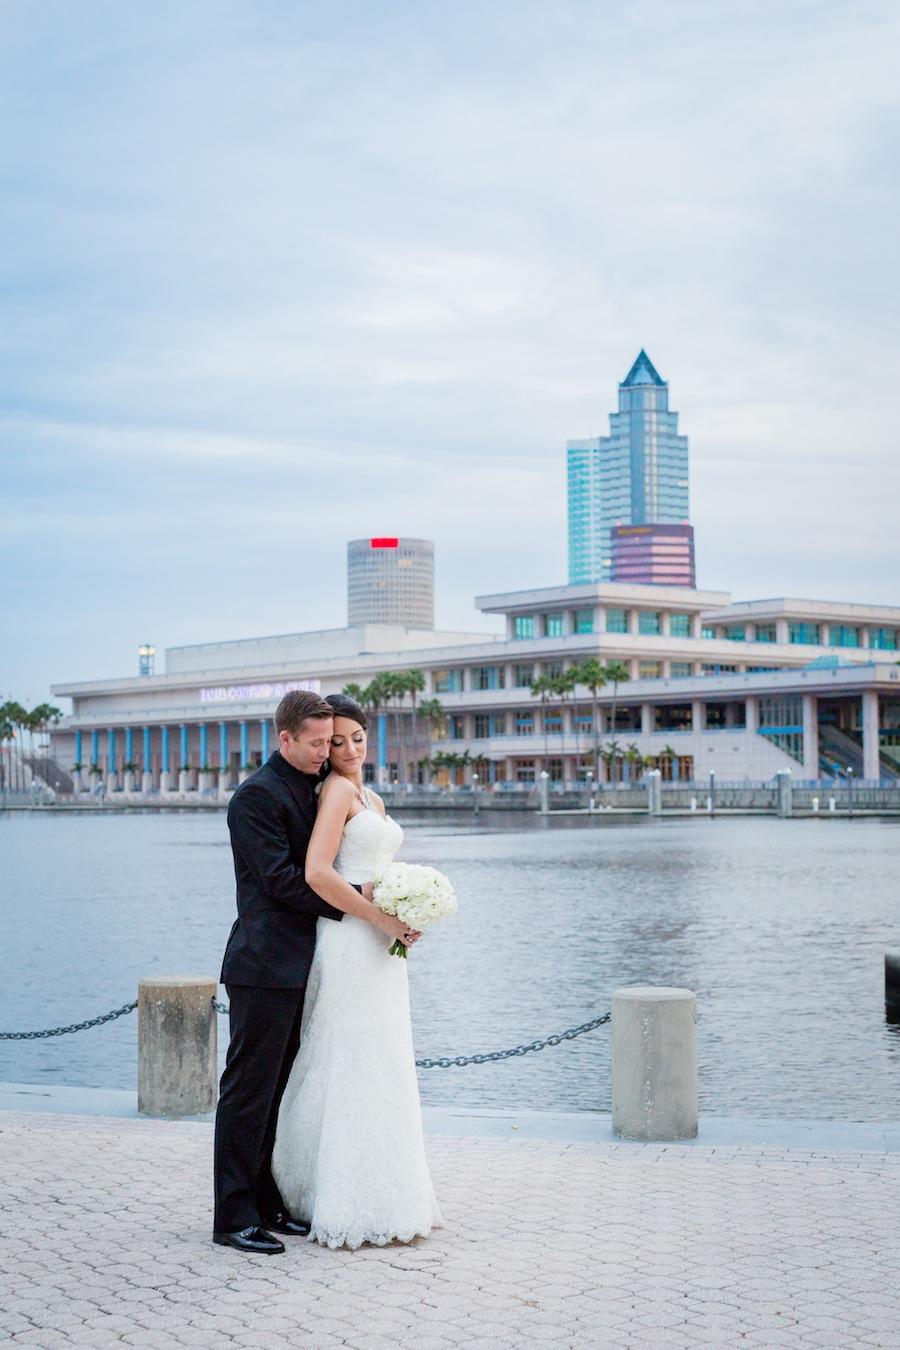 Jen Epstein Wedding Portrait | Downtown Tampa Bride